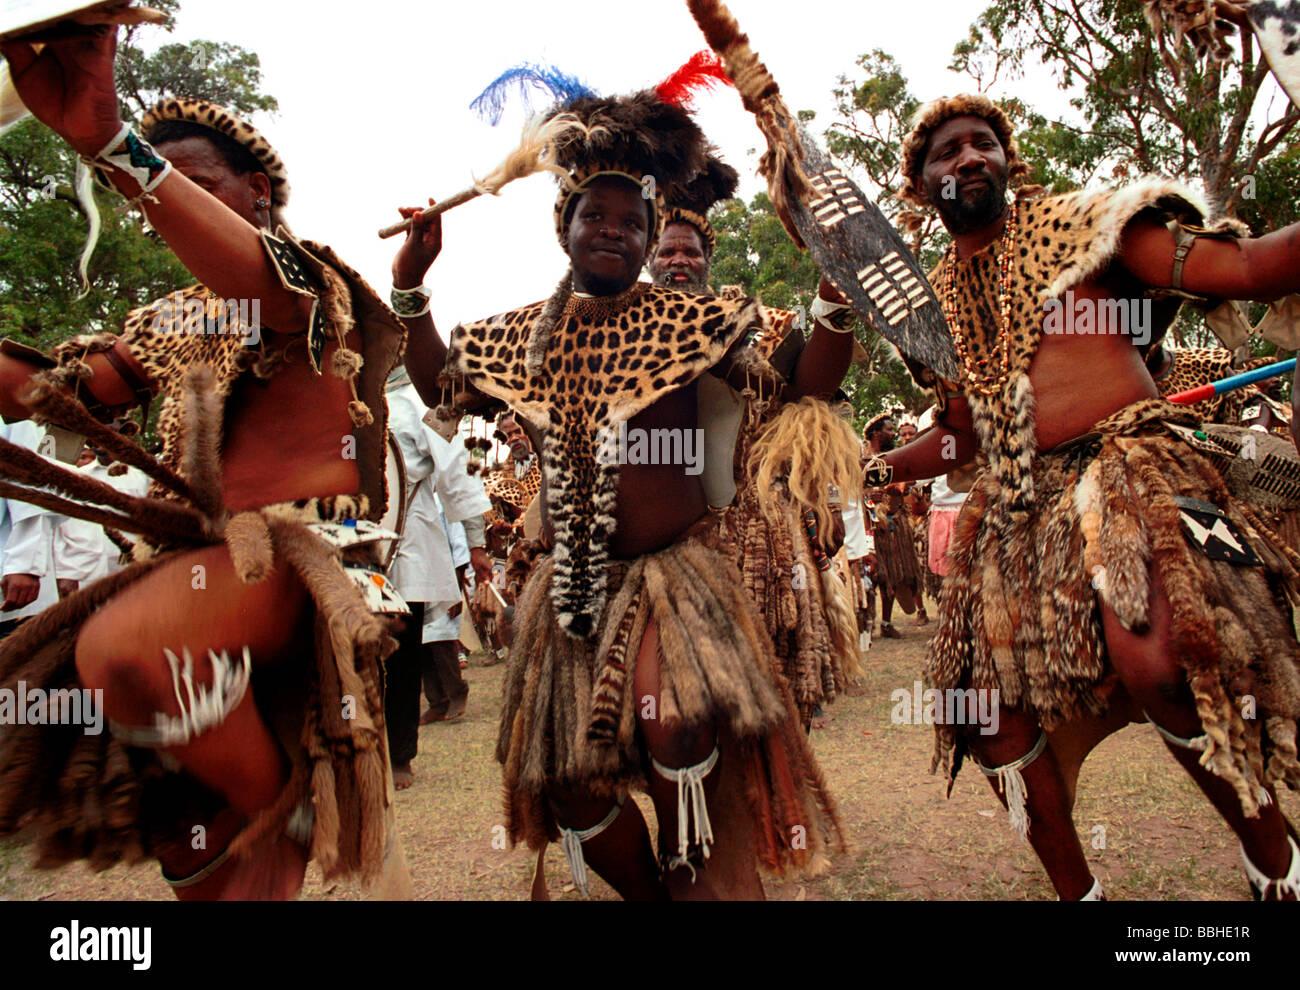 Eshowe kwazulu natal south africa 12 2003 zulu dancing zulus traditional dress african religions zulu people